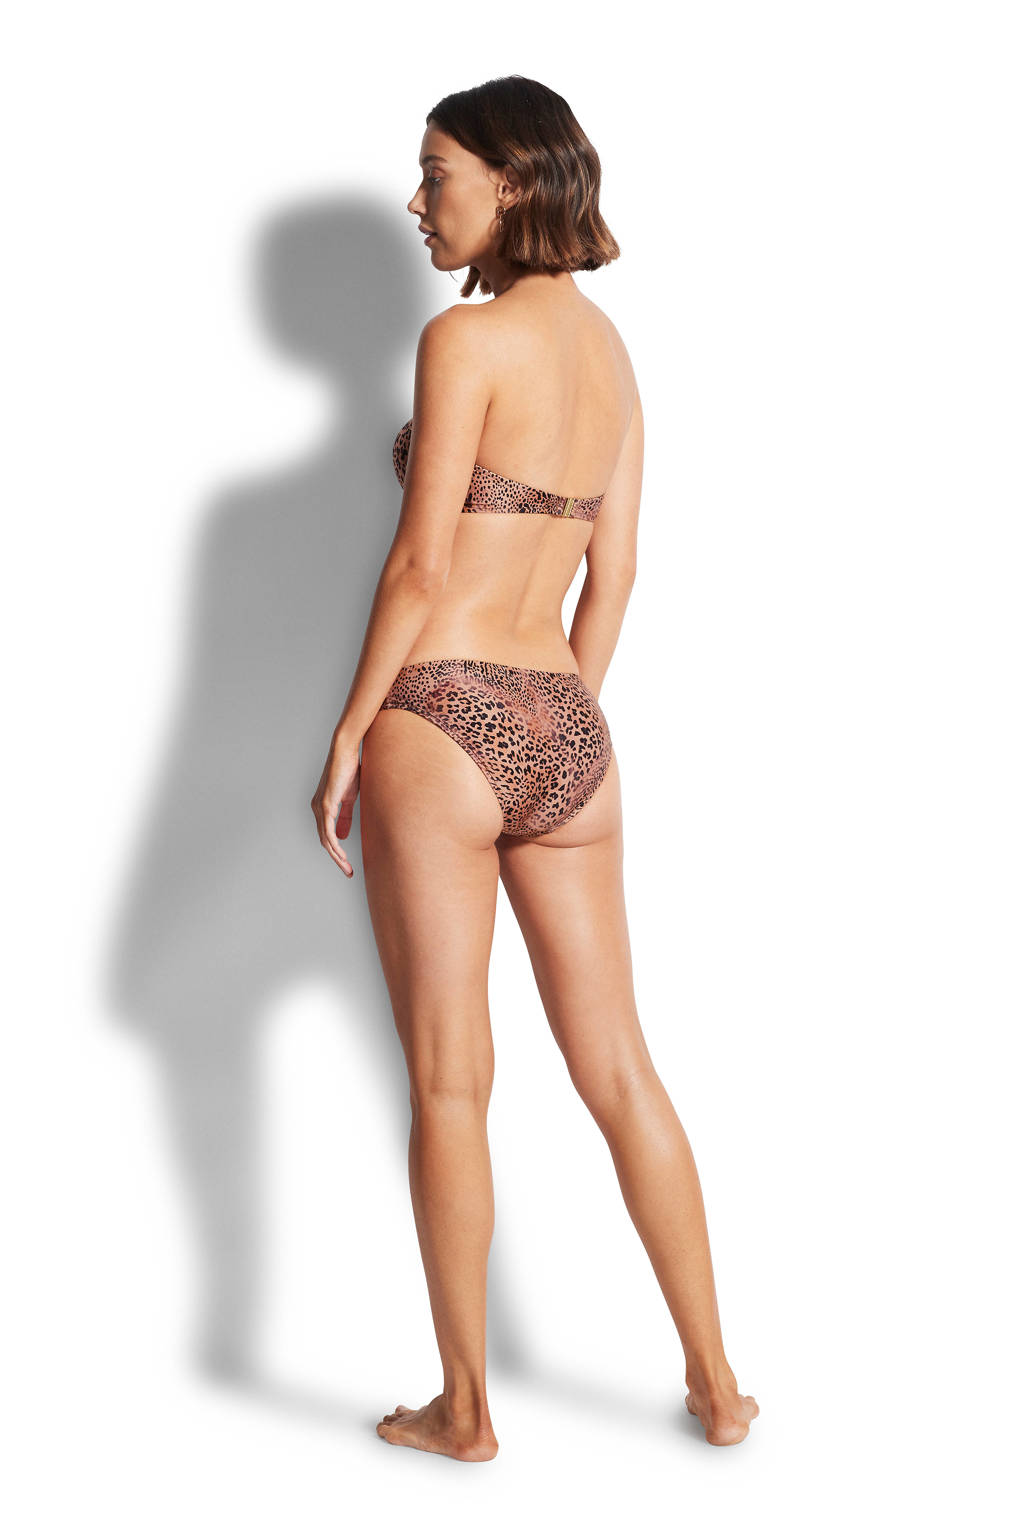 Seafolly bikinibroekje met panterprint bruin/zwart, Bruin/zwart